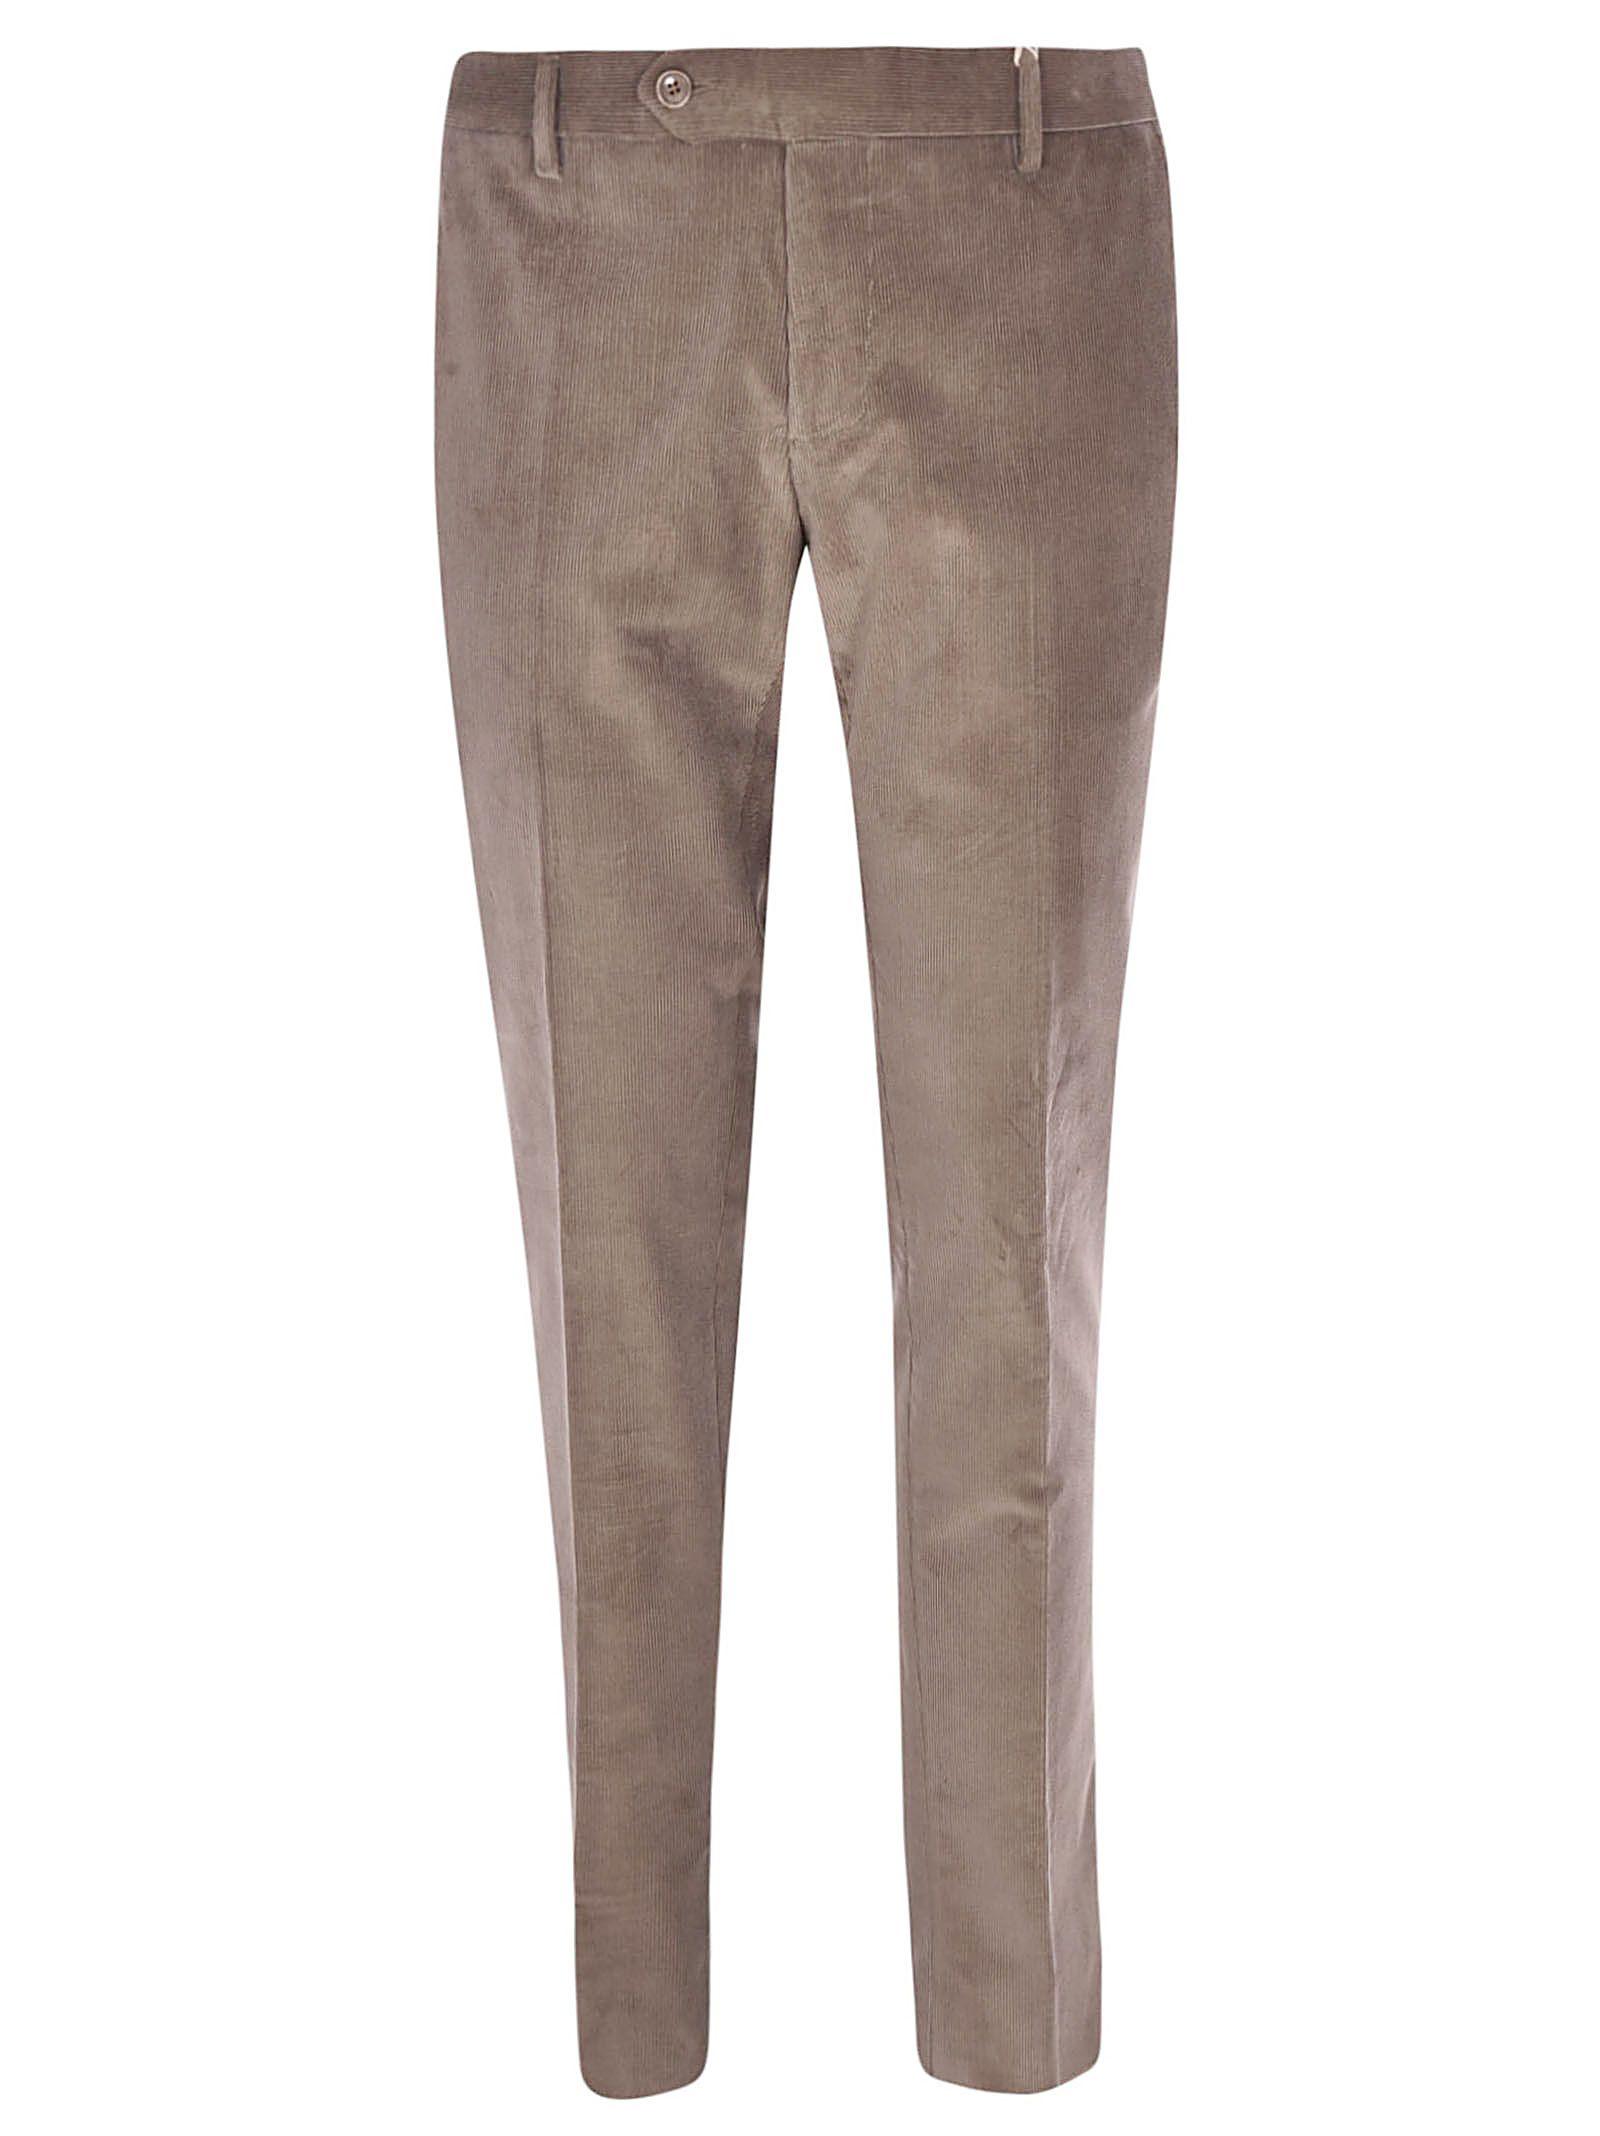 LUIGI BIANCHI MANTOVA Chino Trousers in U